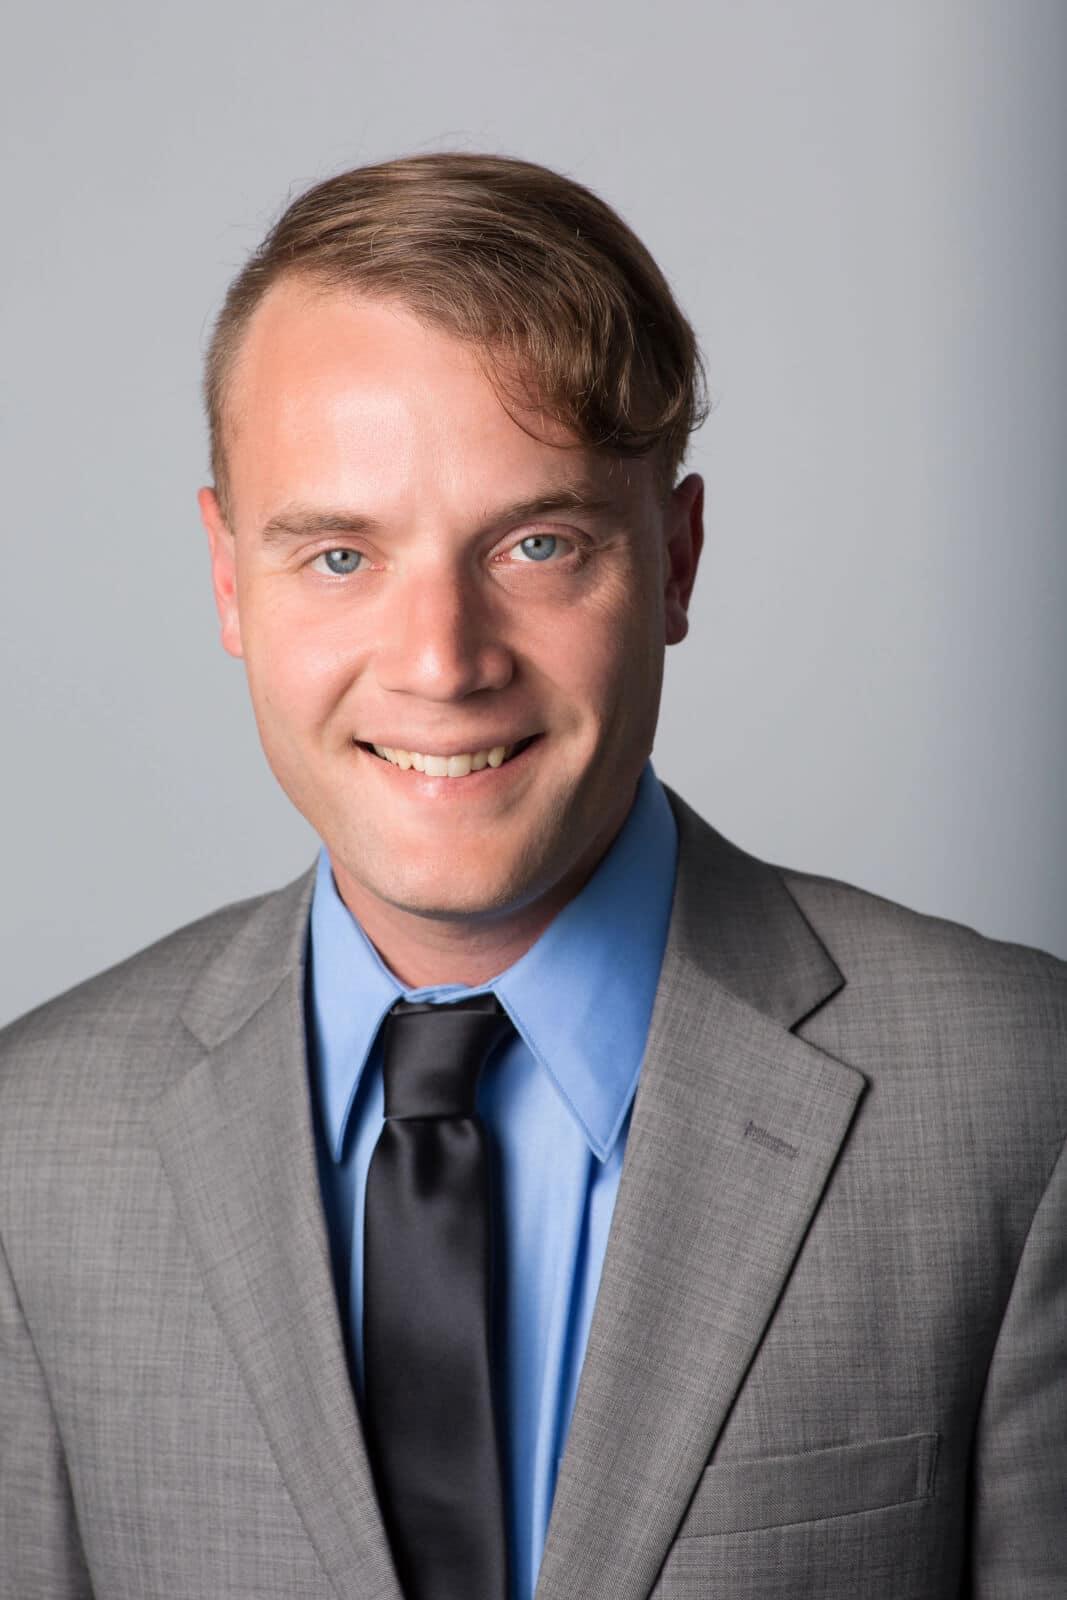 Photo of Jeffrey Juergens